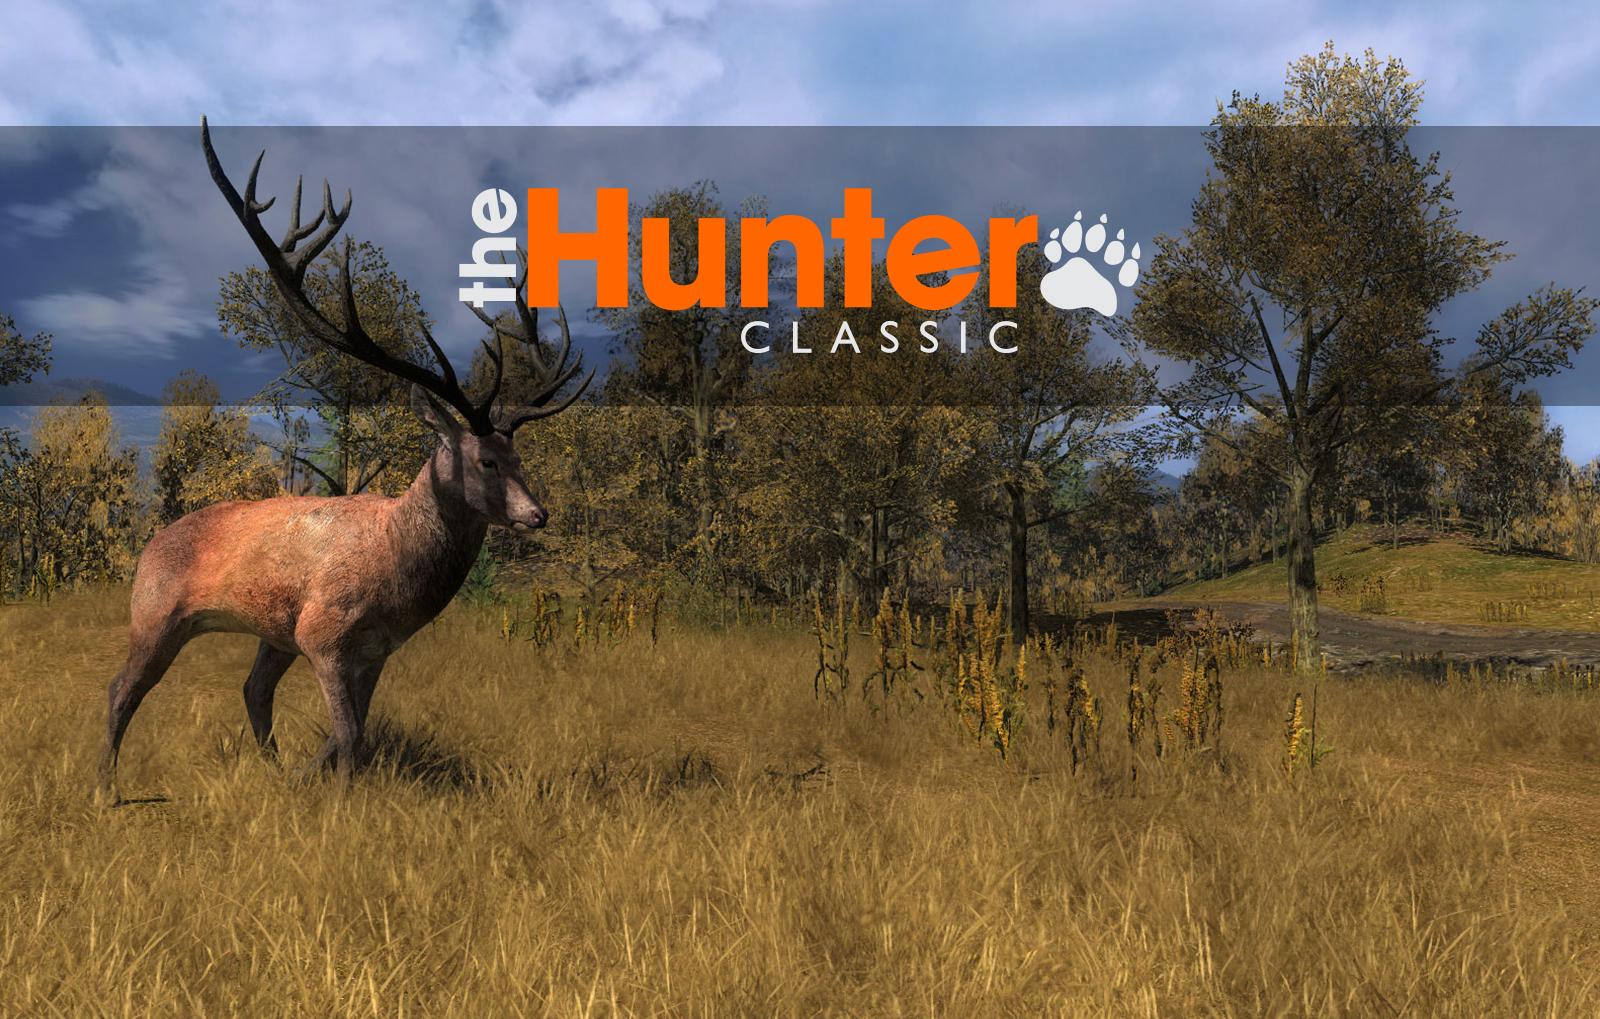 theHunter Classic